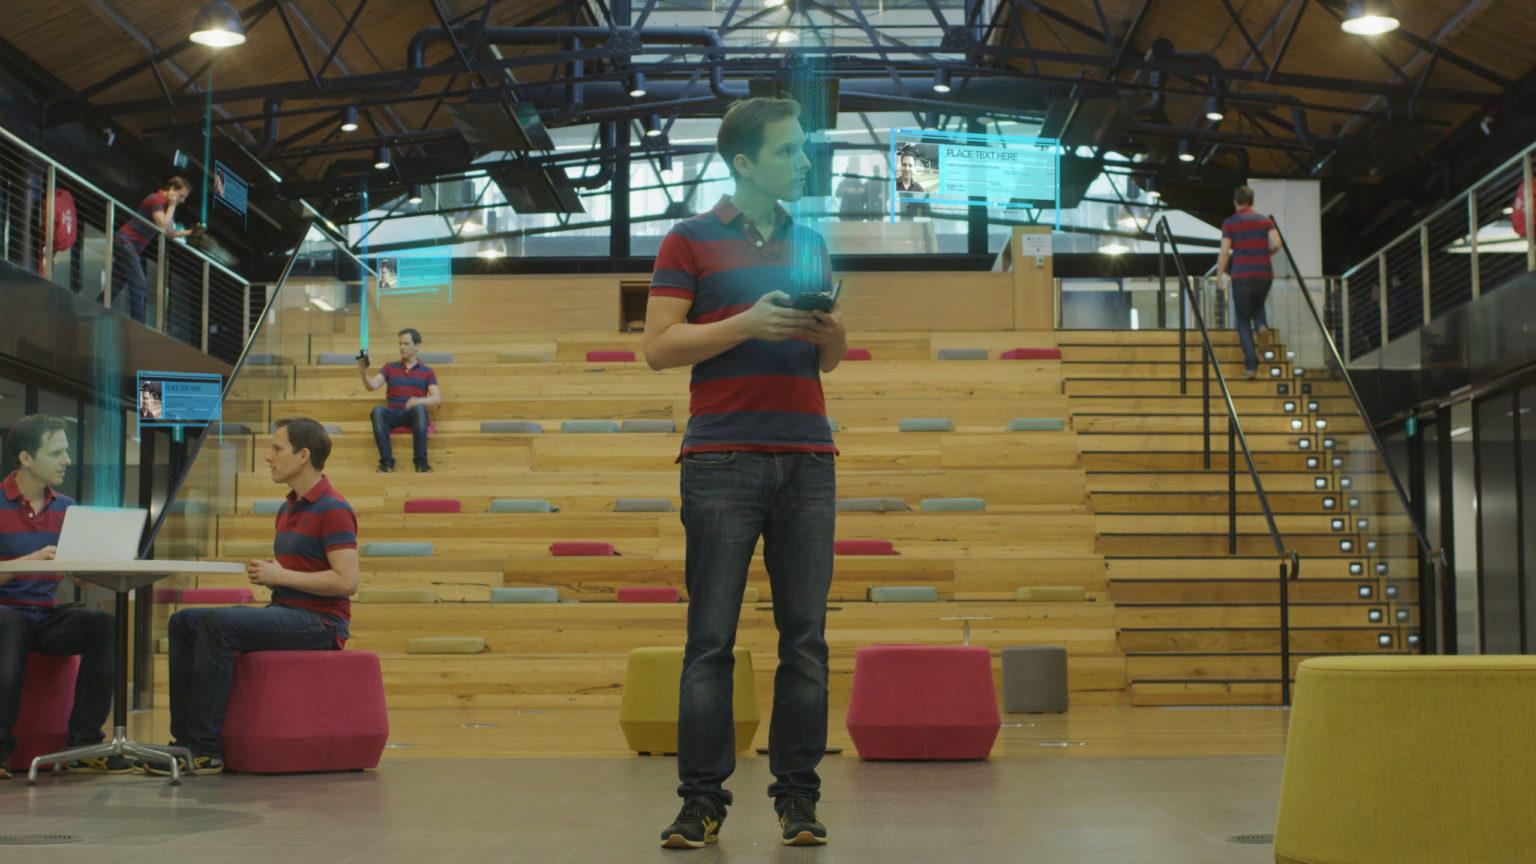 Scène futuriste de Cryptopia, un film sur Bitcoin et les cryptomonnaies